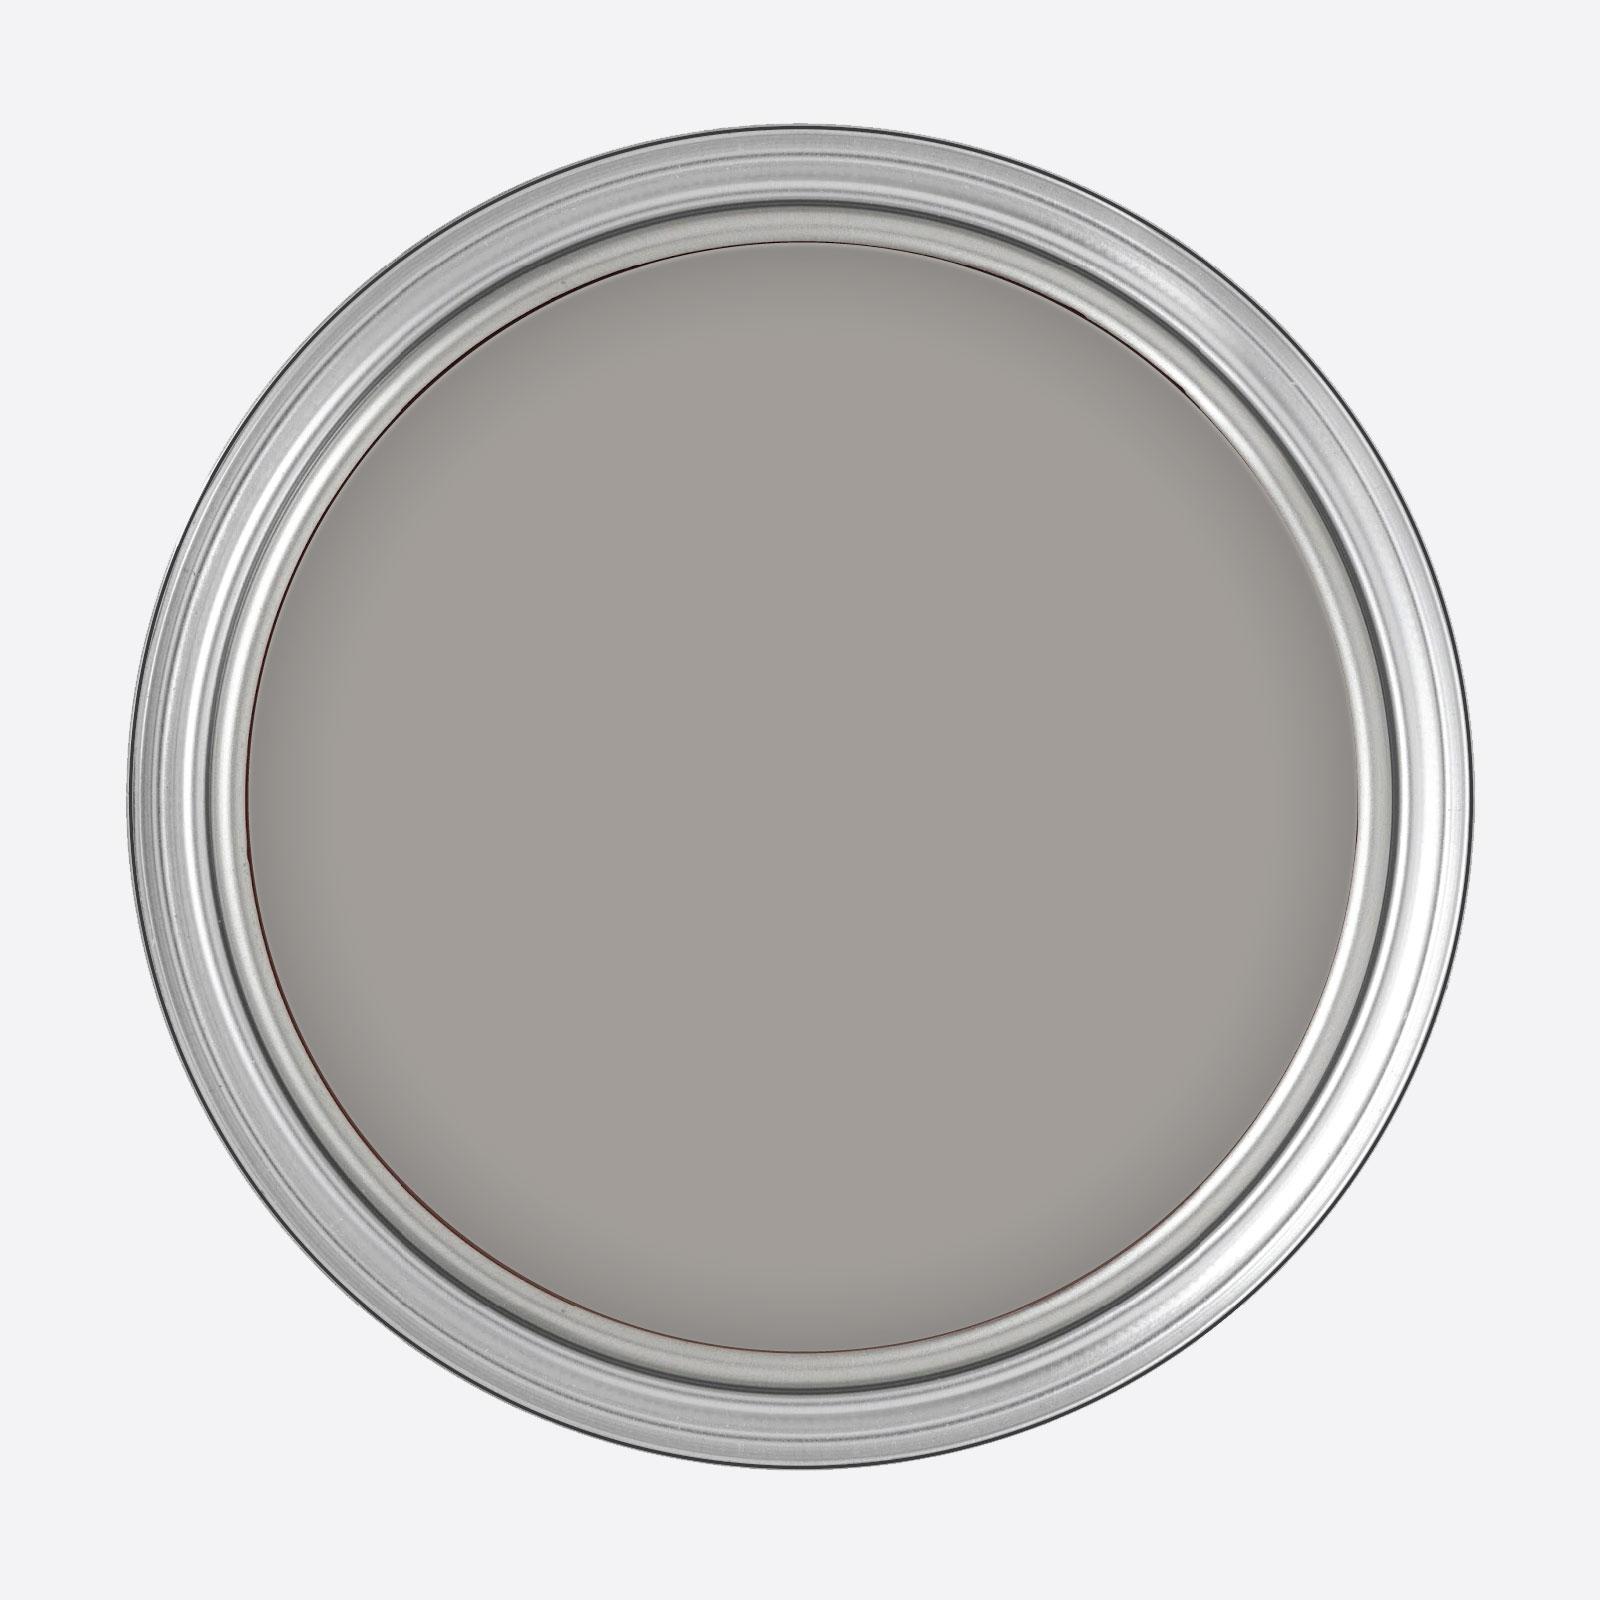 Linoljefärg 30% Grön Umbra Natur 0.16 L